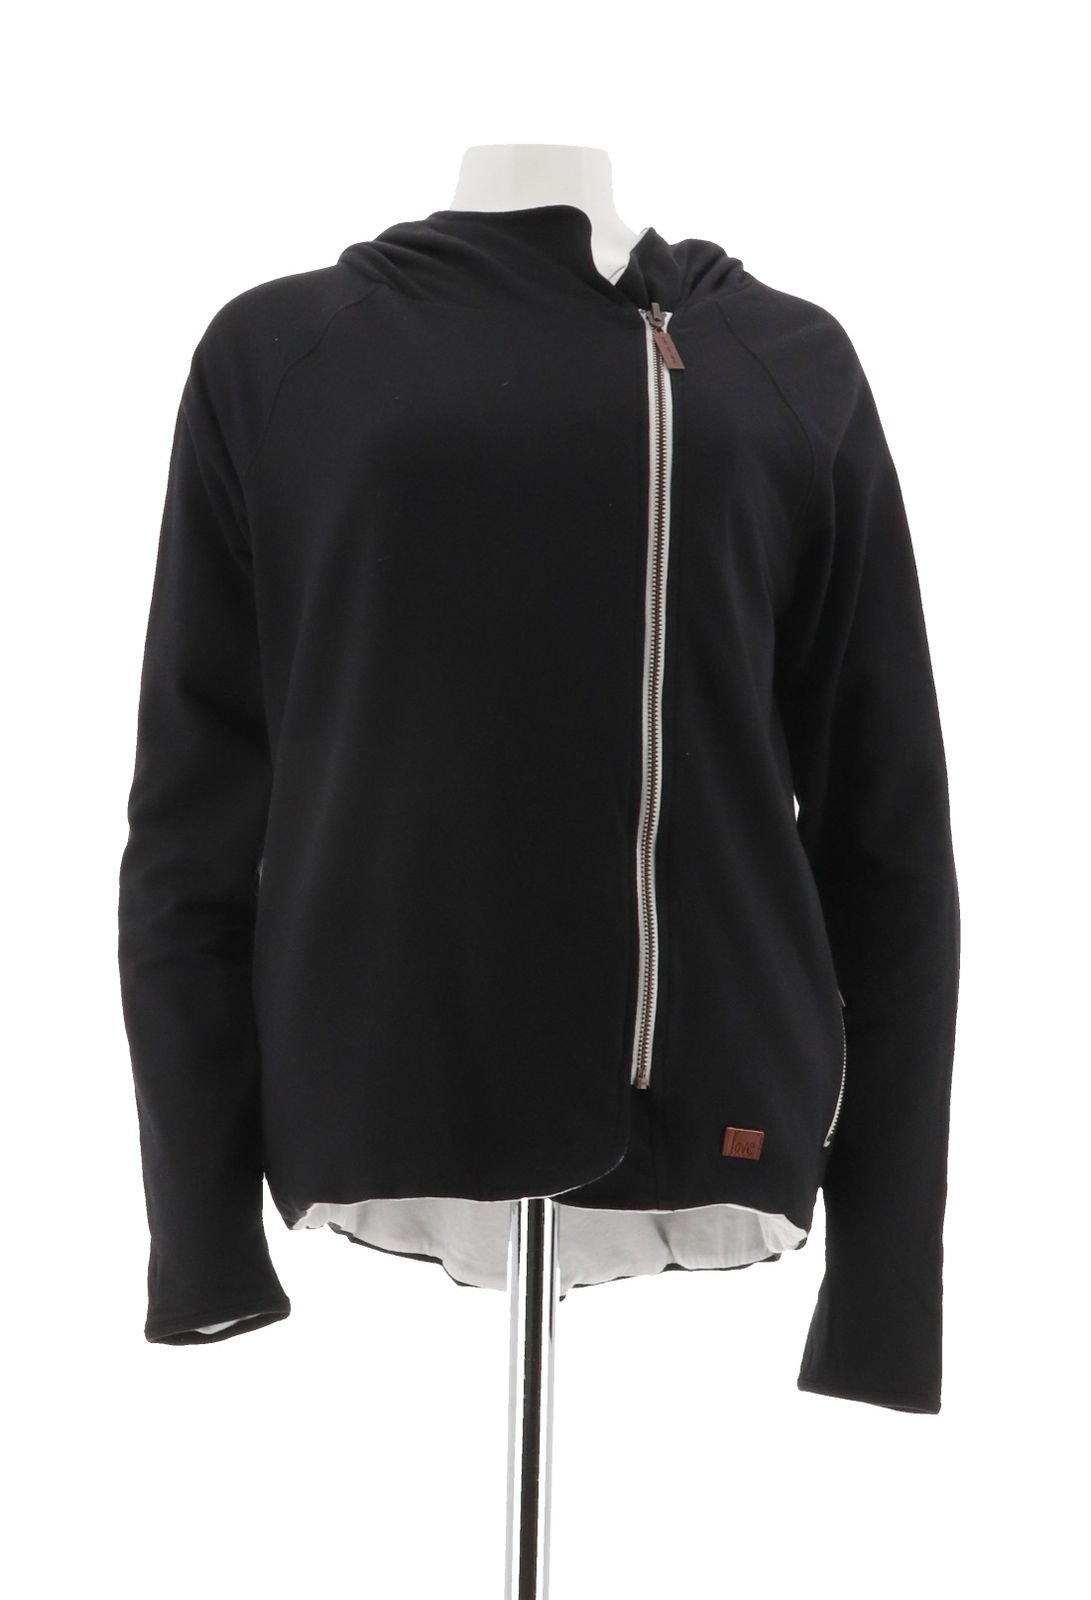 Peace Love World Reversible Zip Hooded Jacket A290290, Black White, L